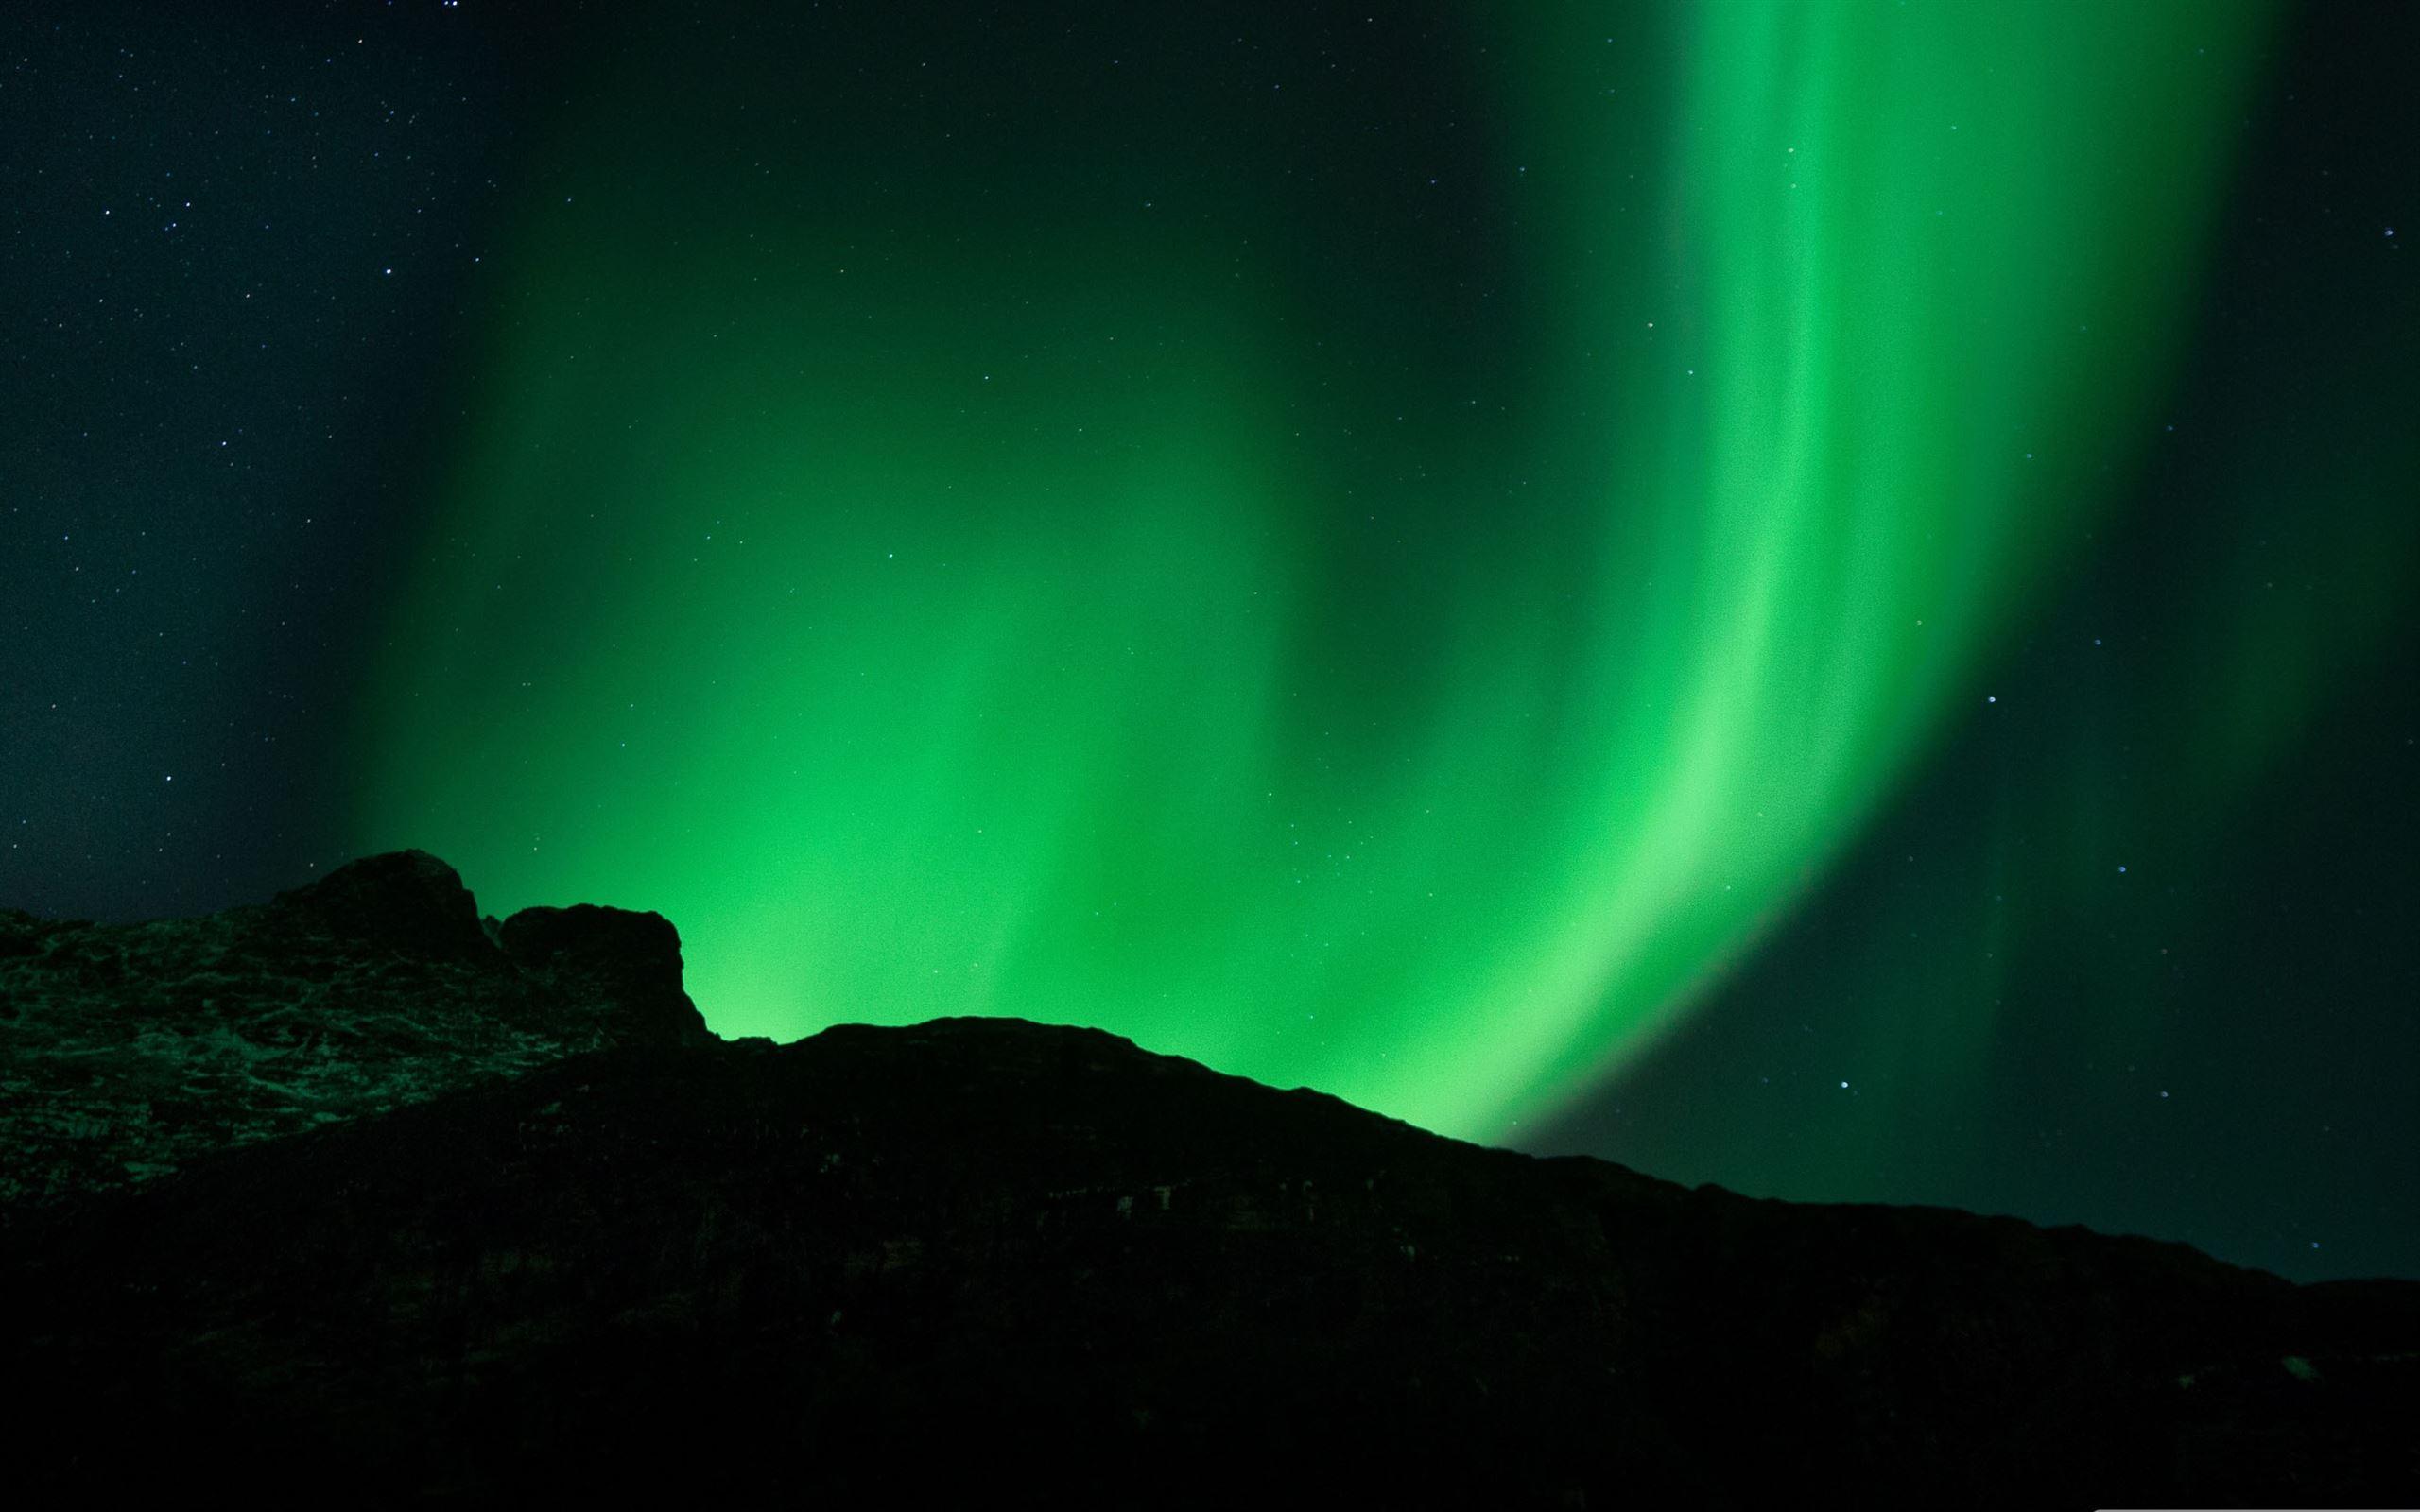 aurora borealis mac wallpaper download free mac